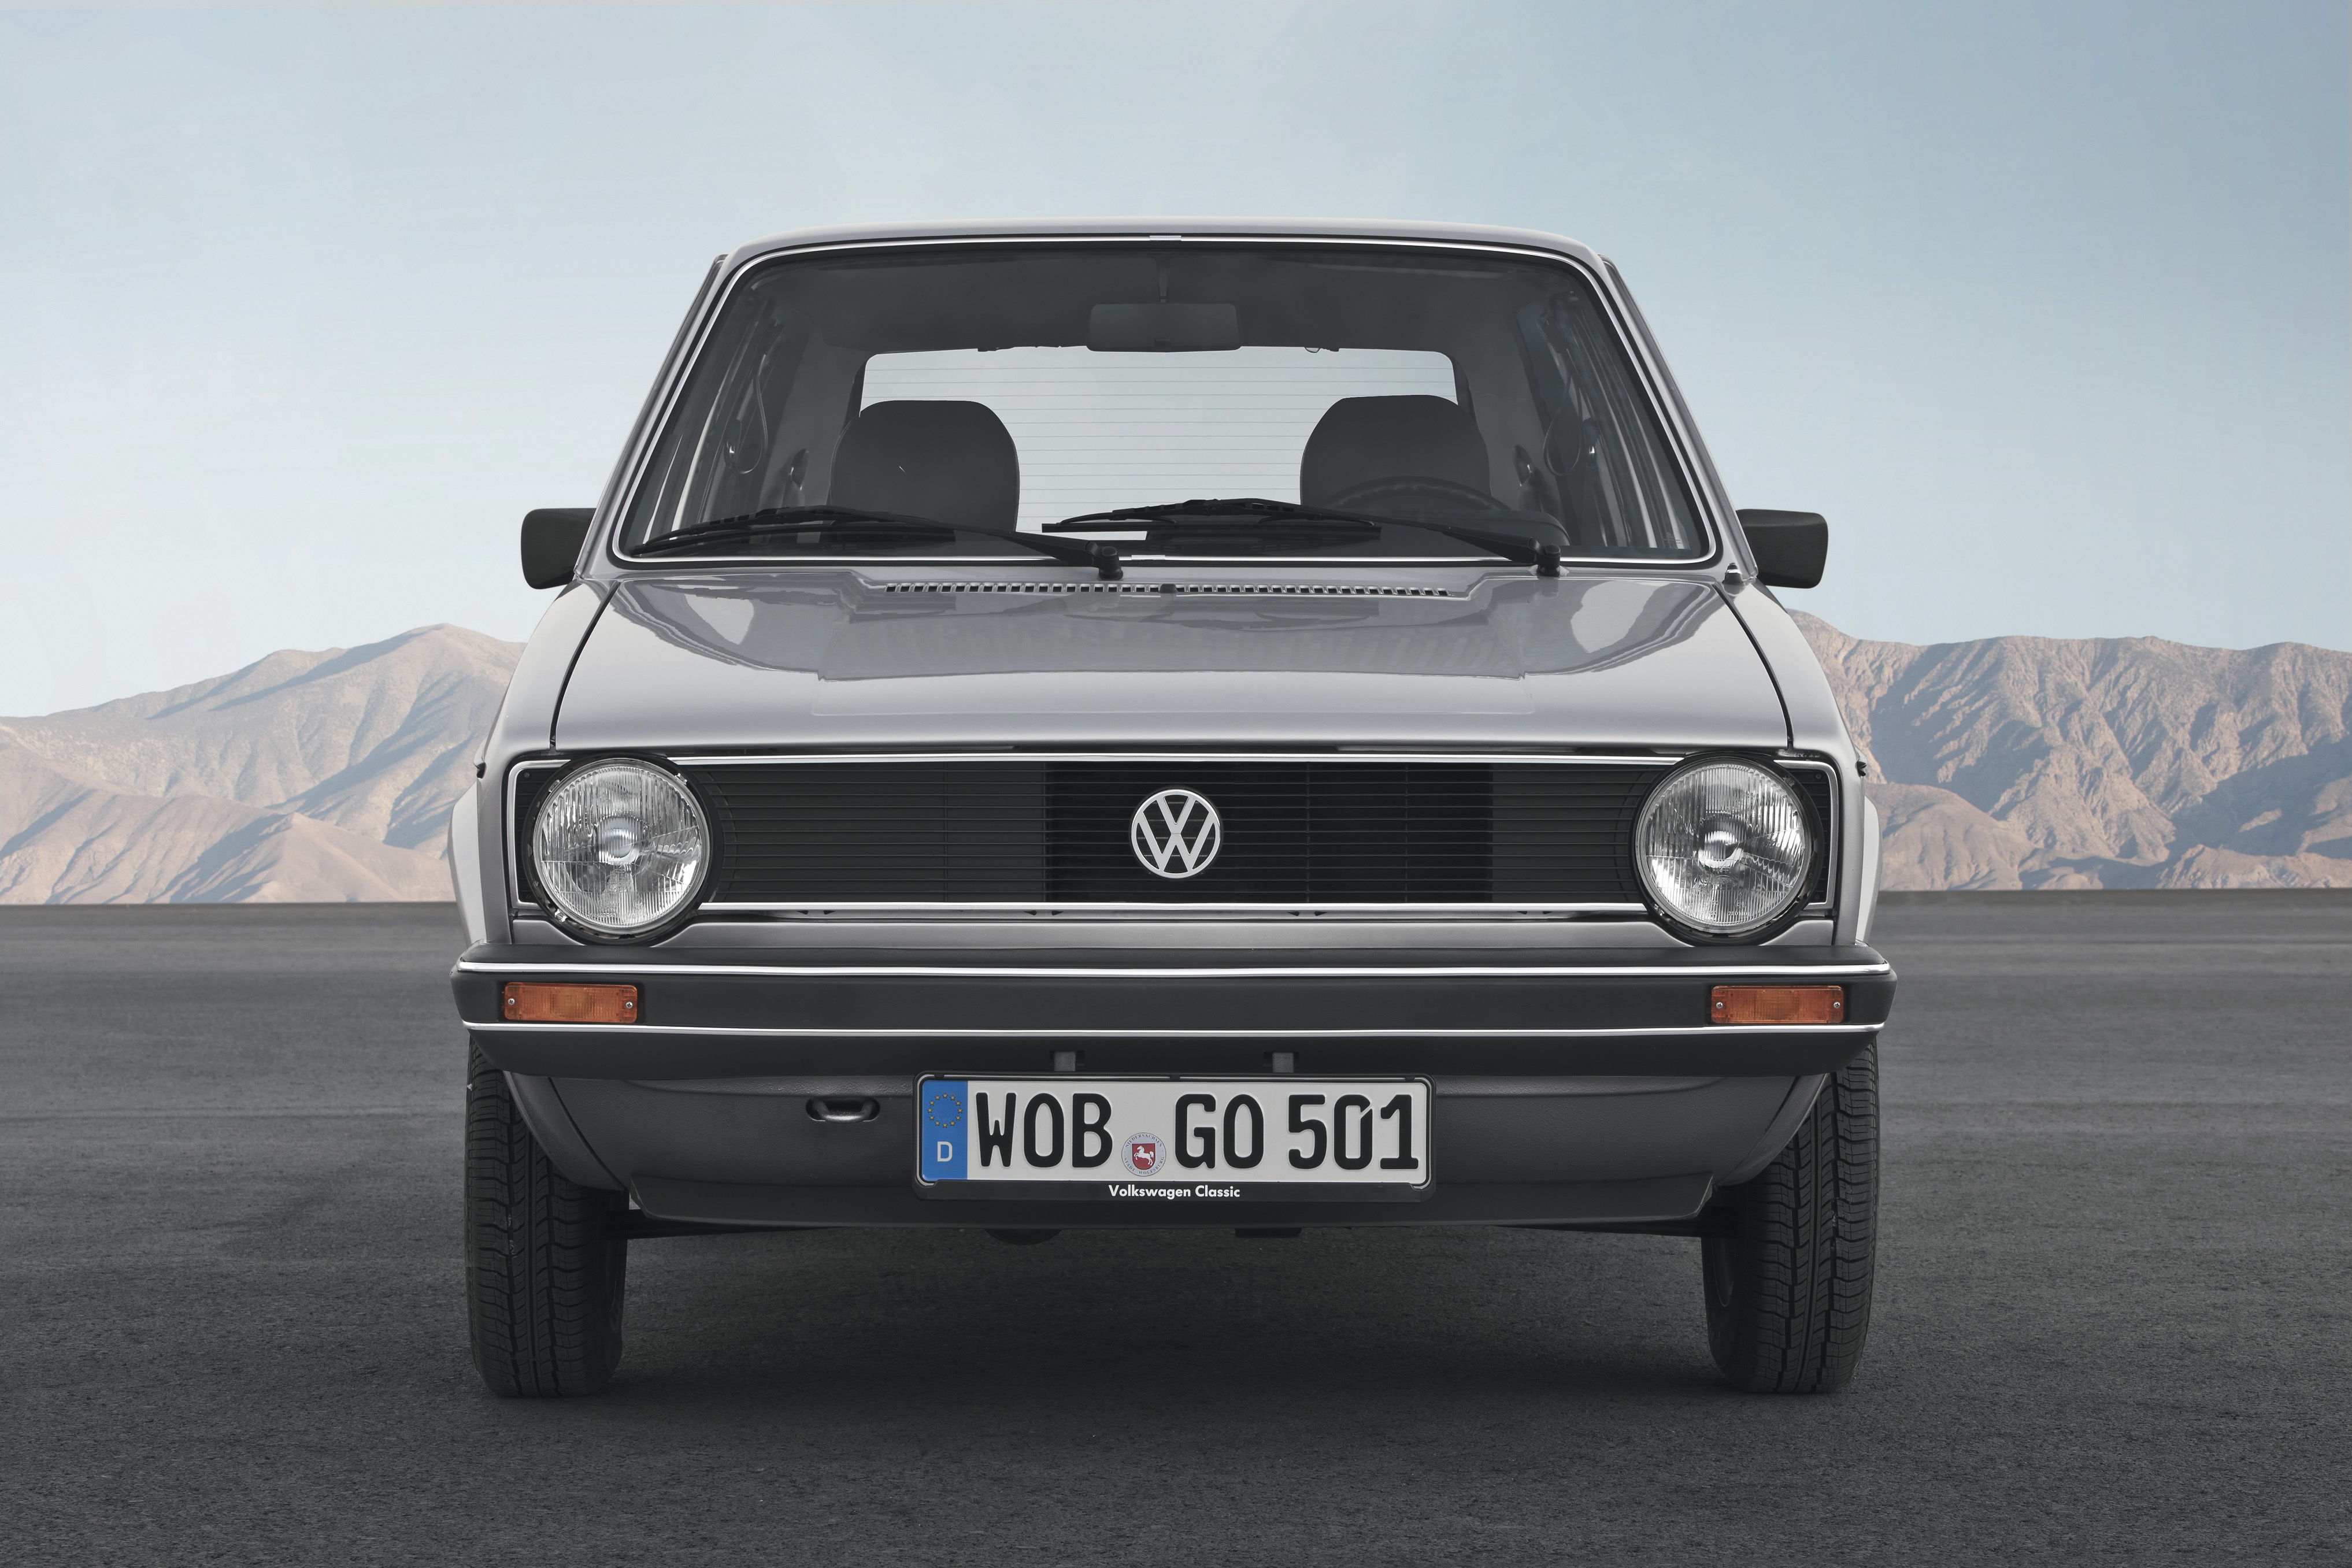 Mk1 Volkswagen Golf